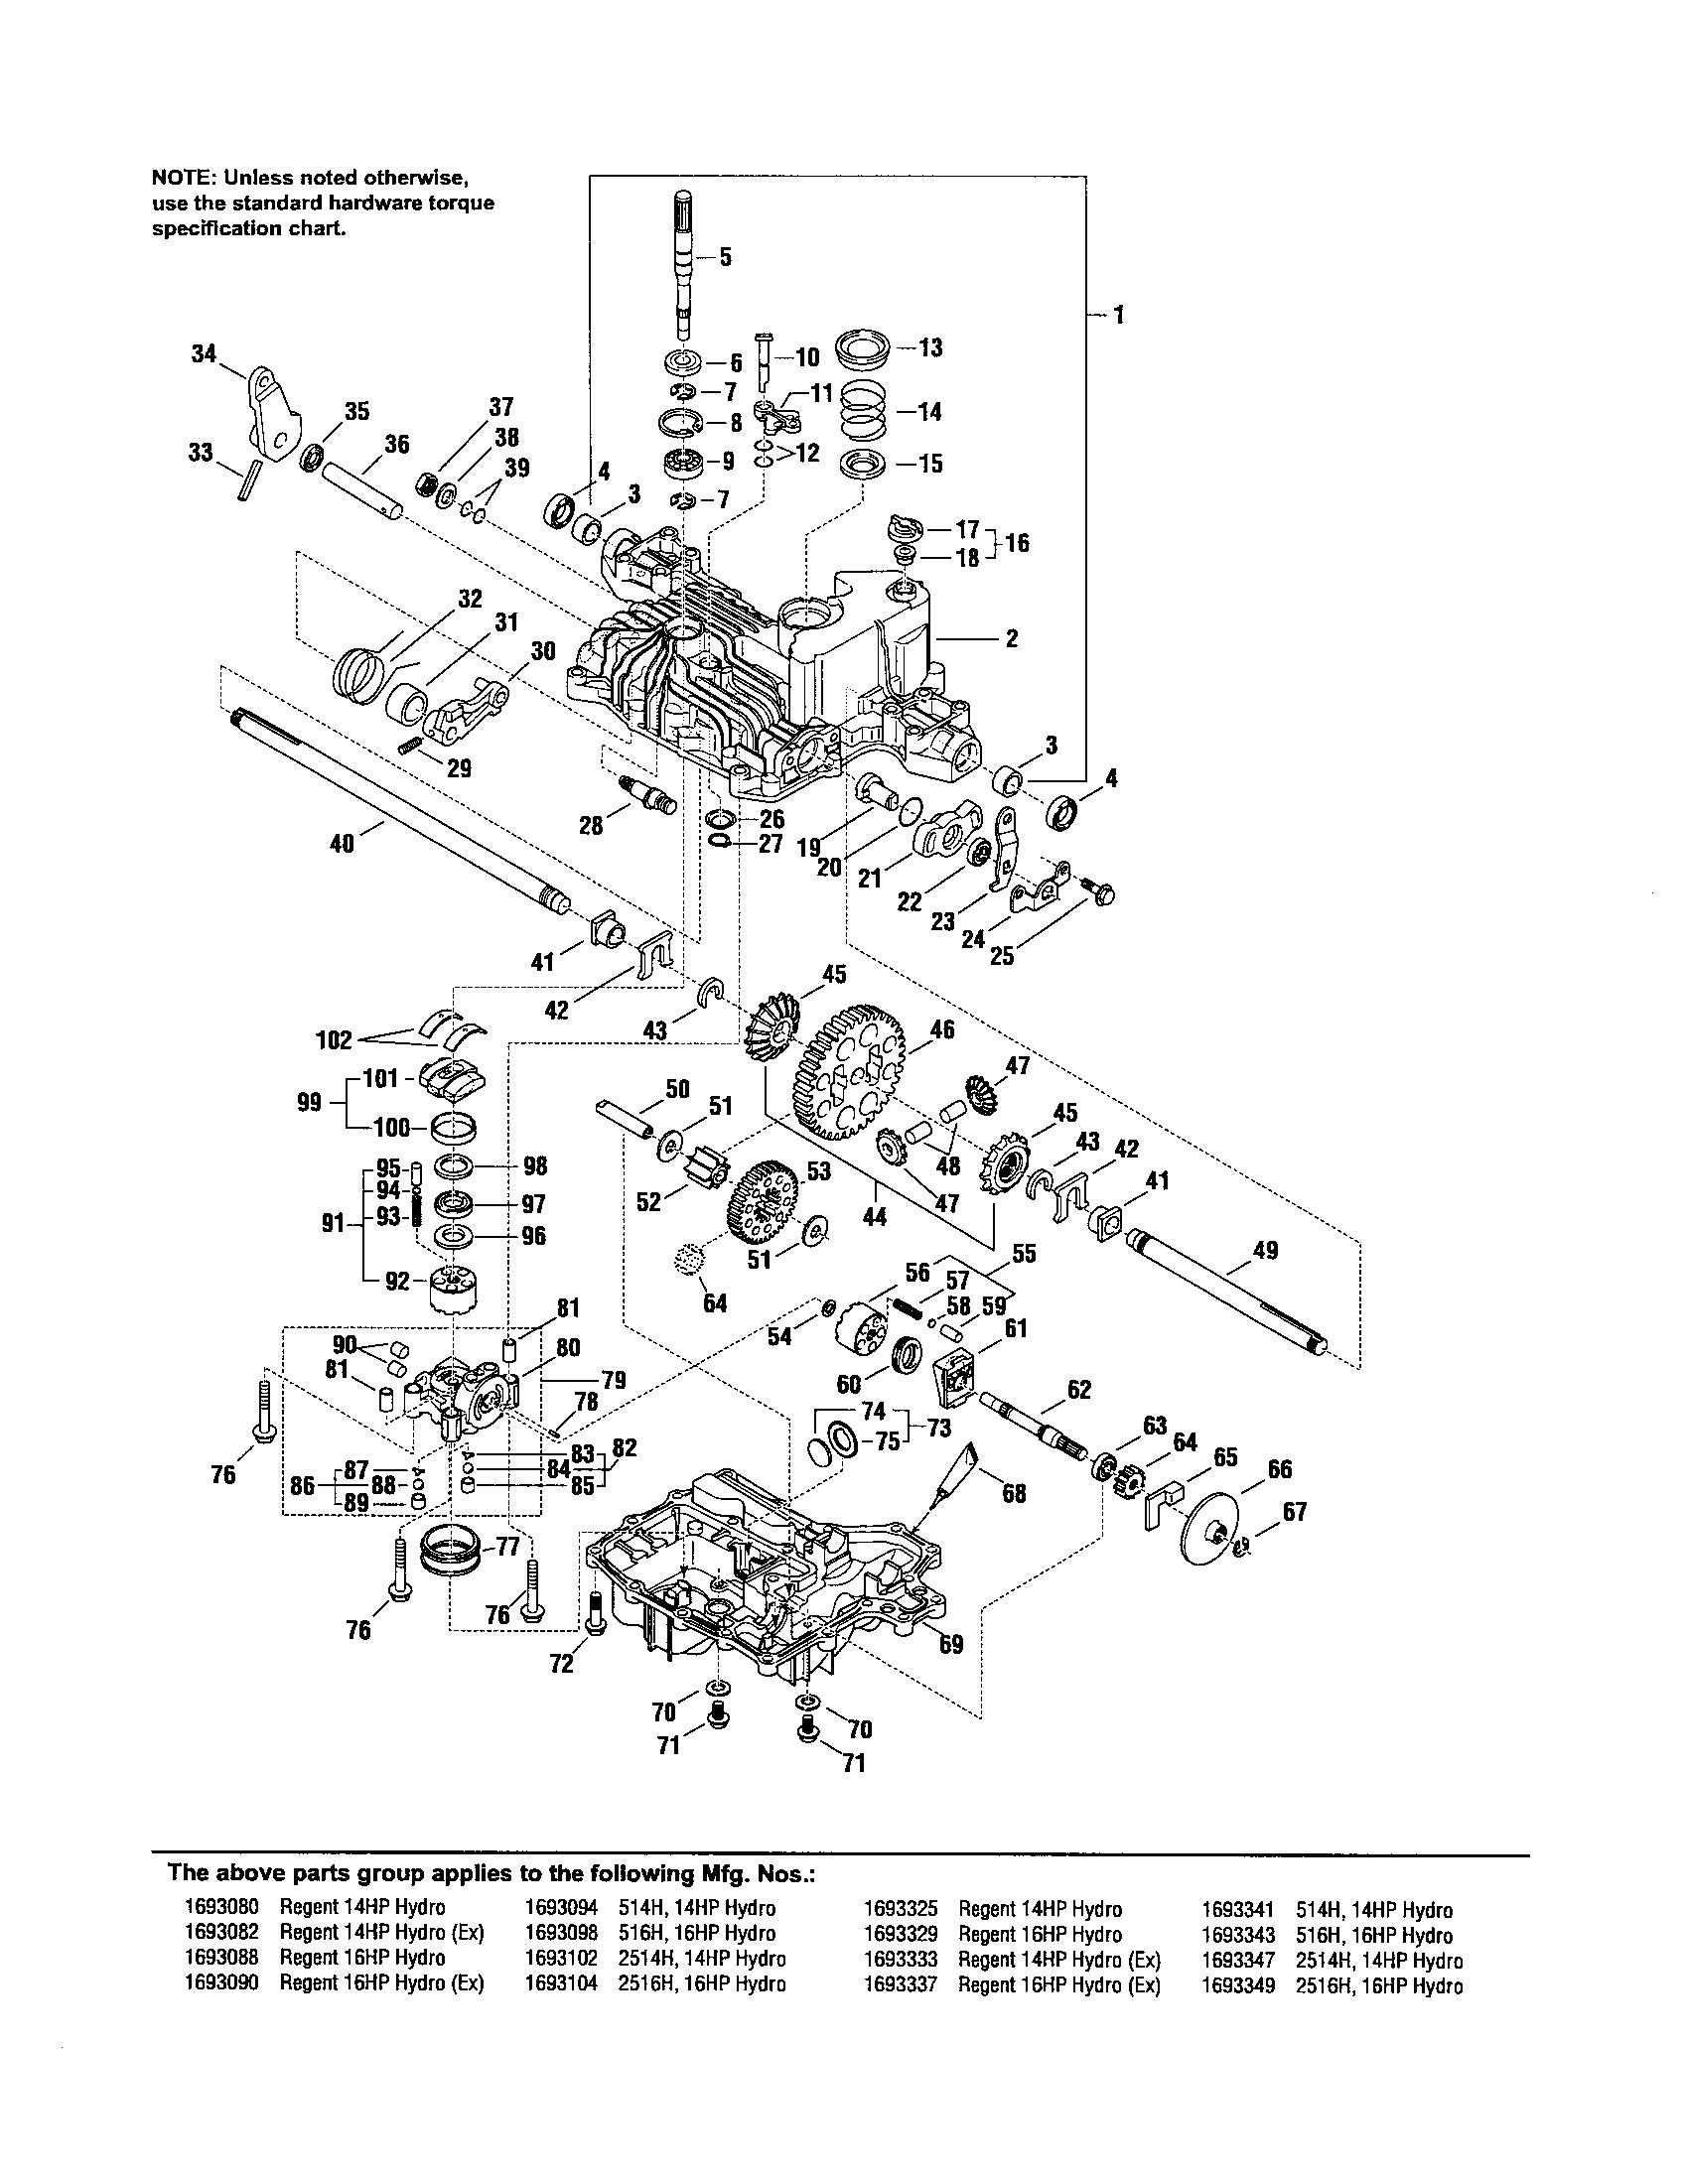 Tuff Torq K46 Transaxle Parts Diagram, Tuff, Free Engine